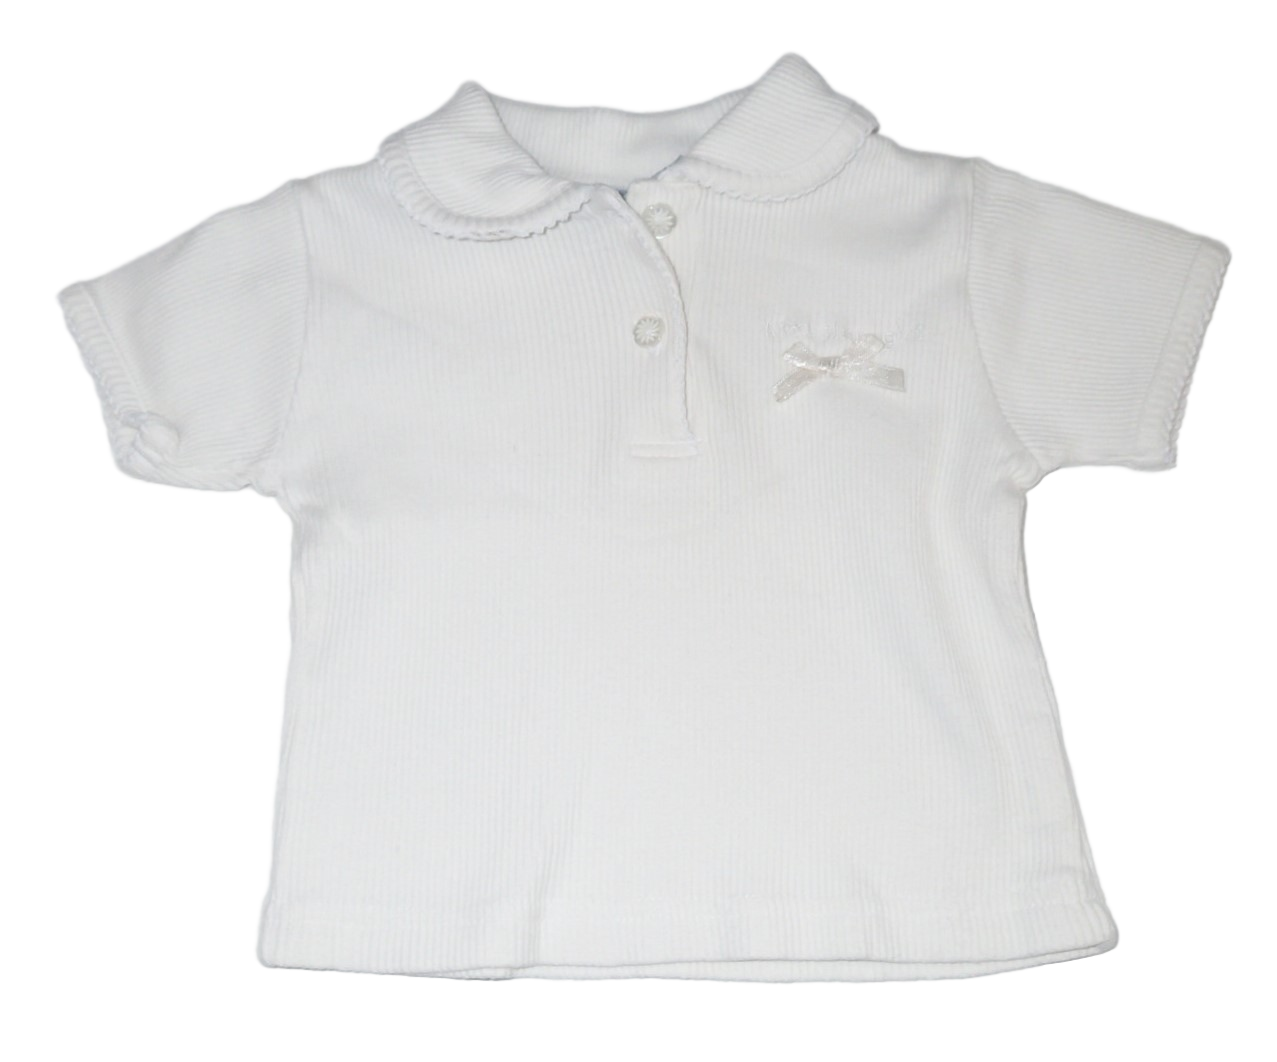 Kimbaloo -T-shirt Taille 6 mois